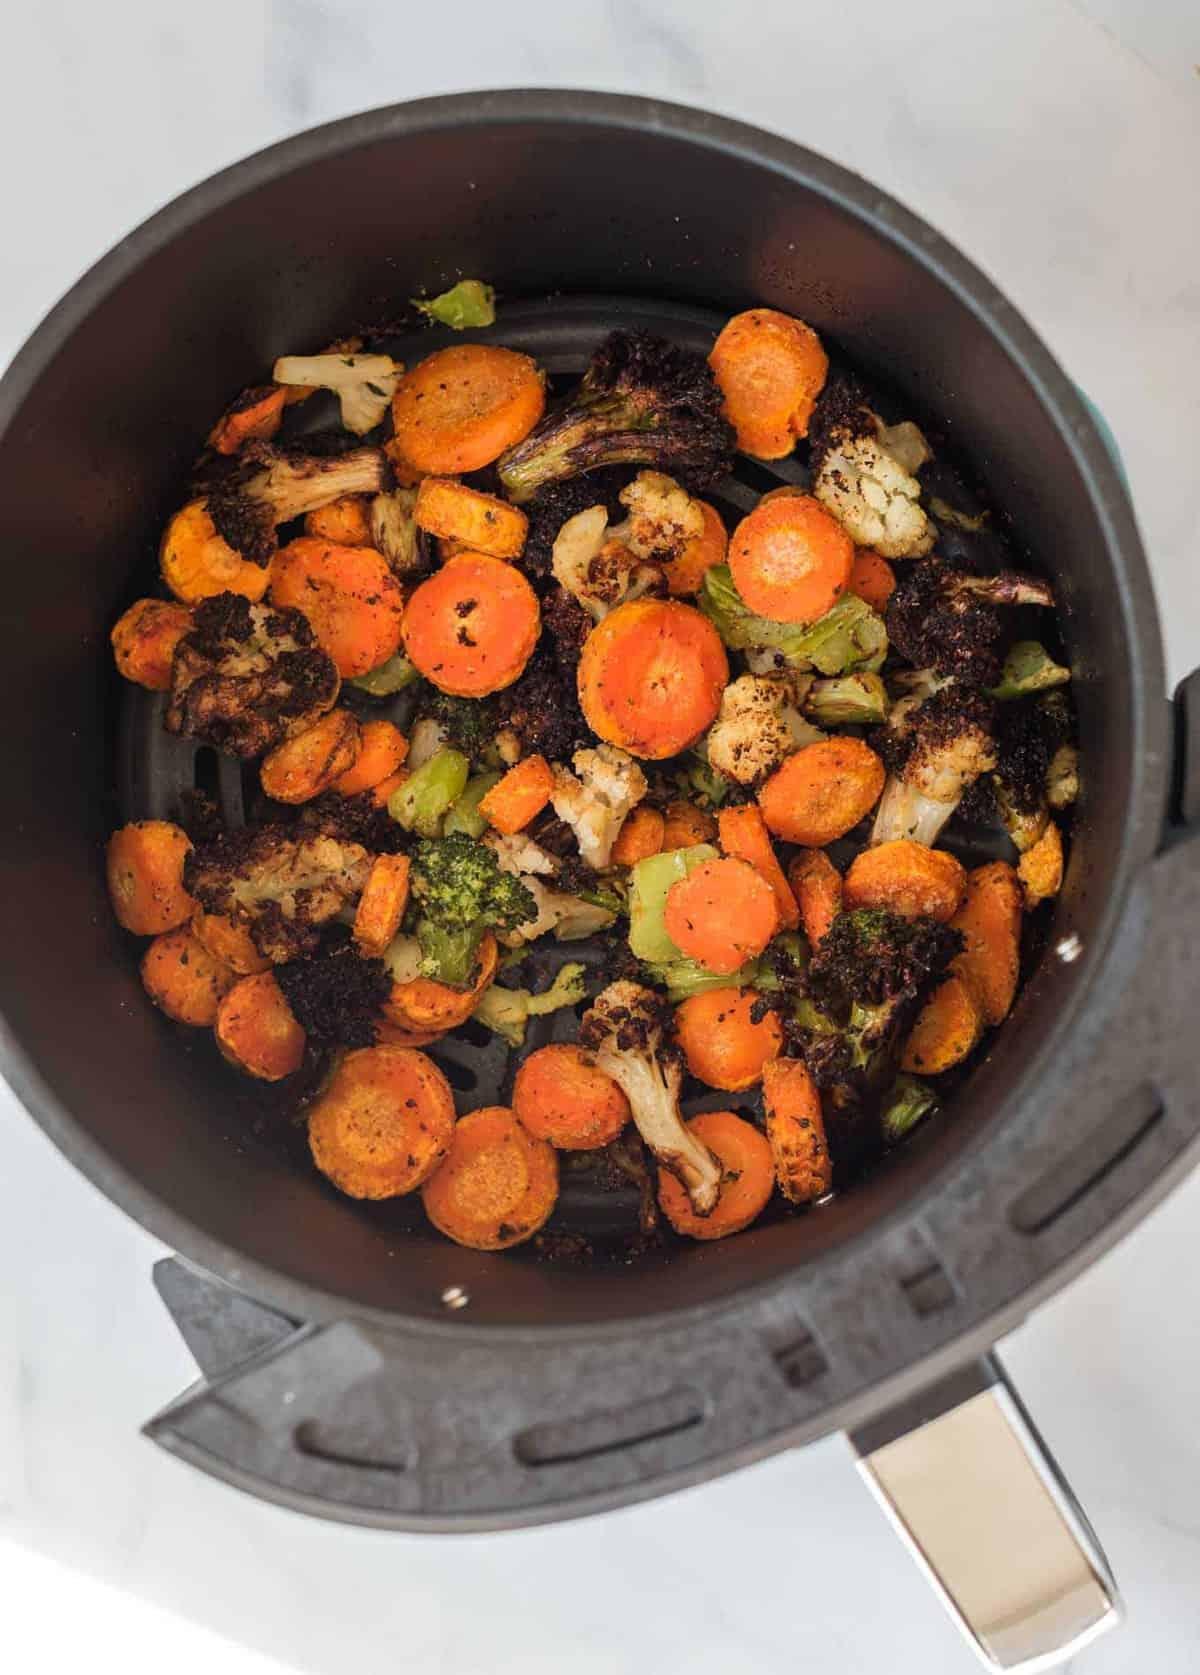 air fried crispy frozen vegetables in the air fryer basket